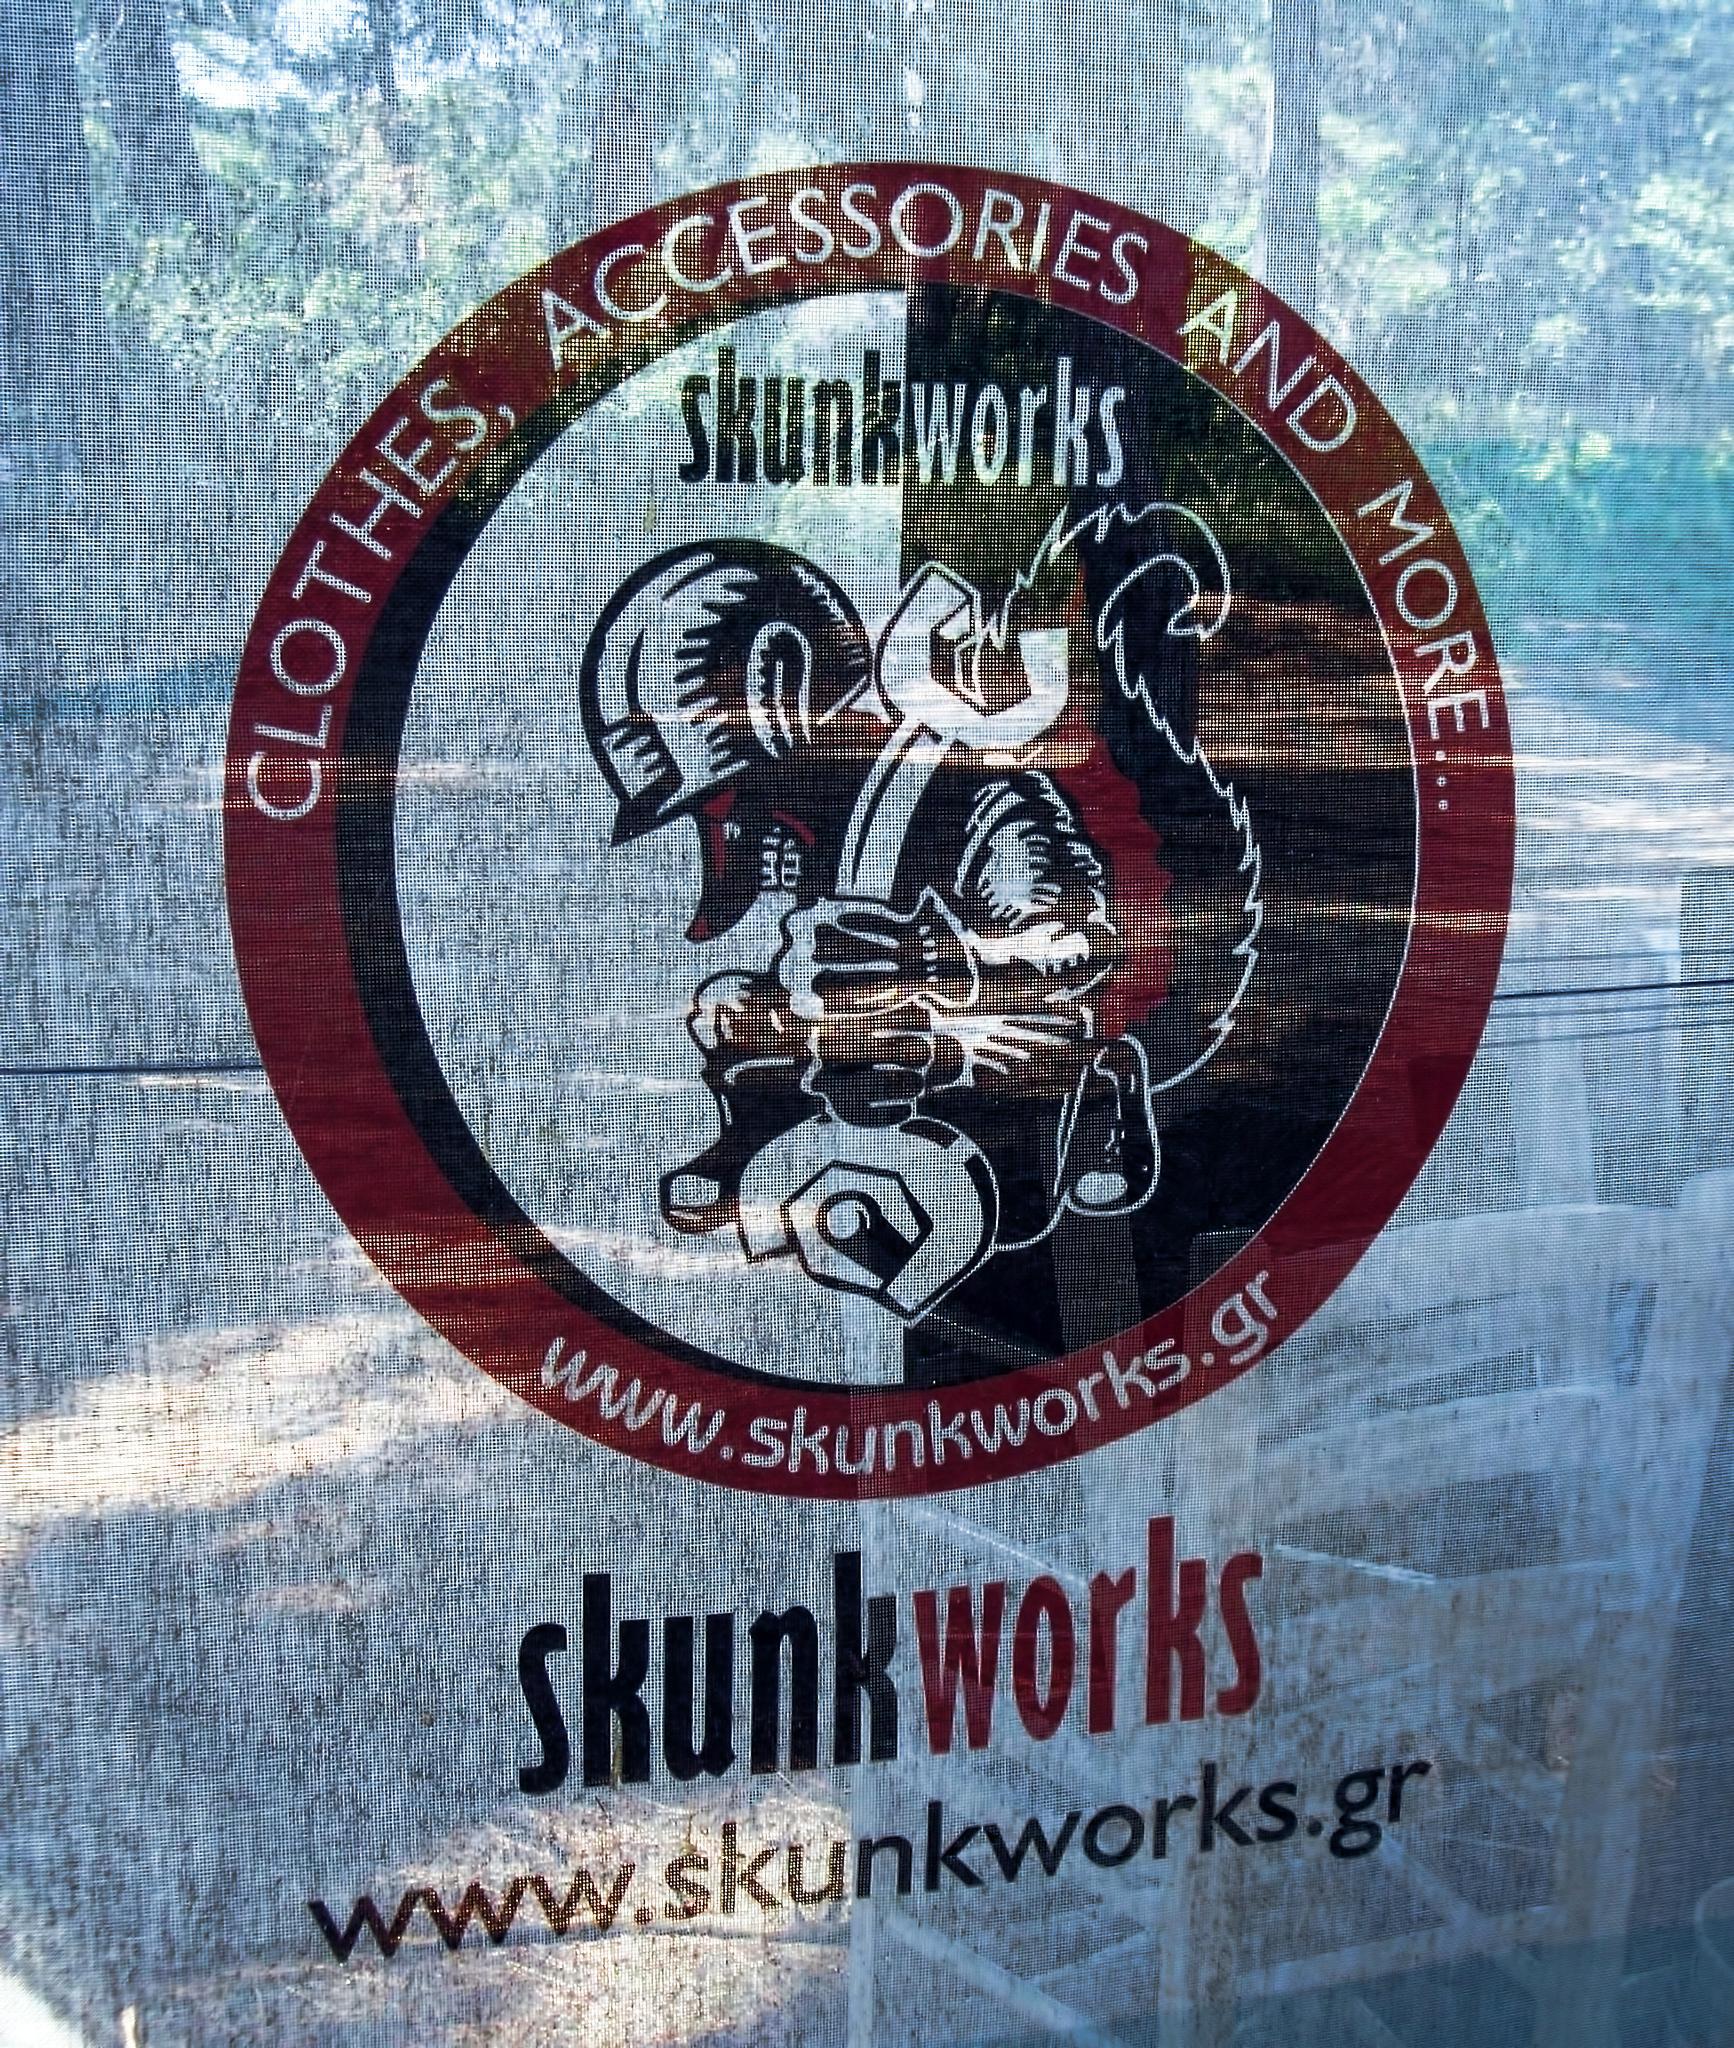 Skunkworks. by geofftodhunter